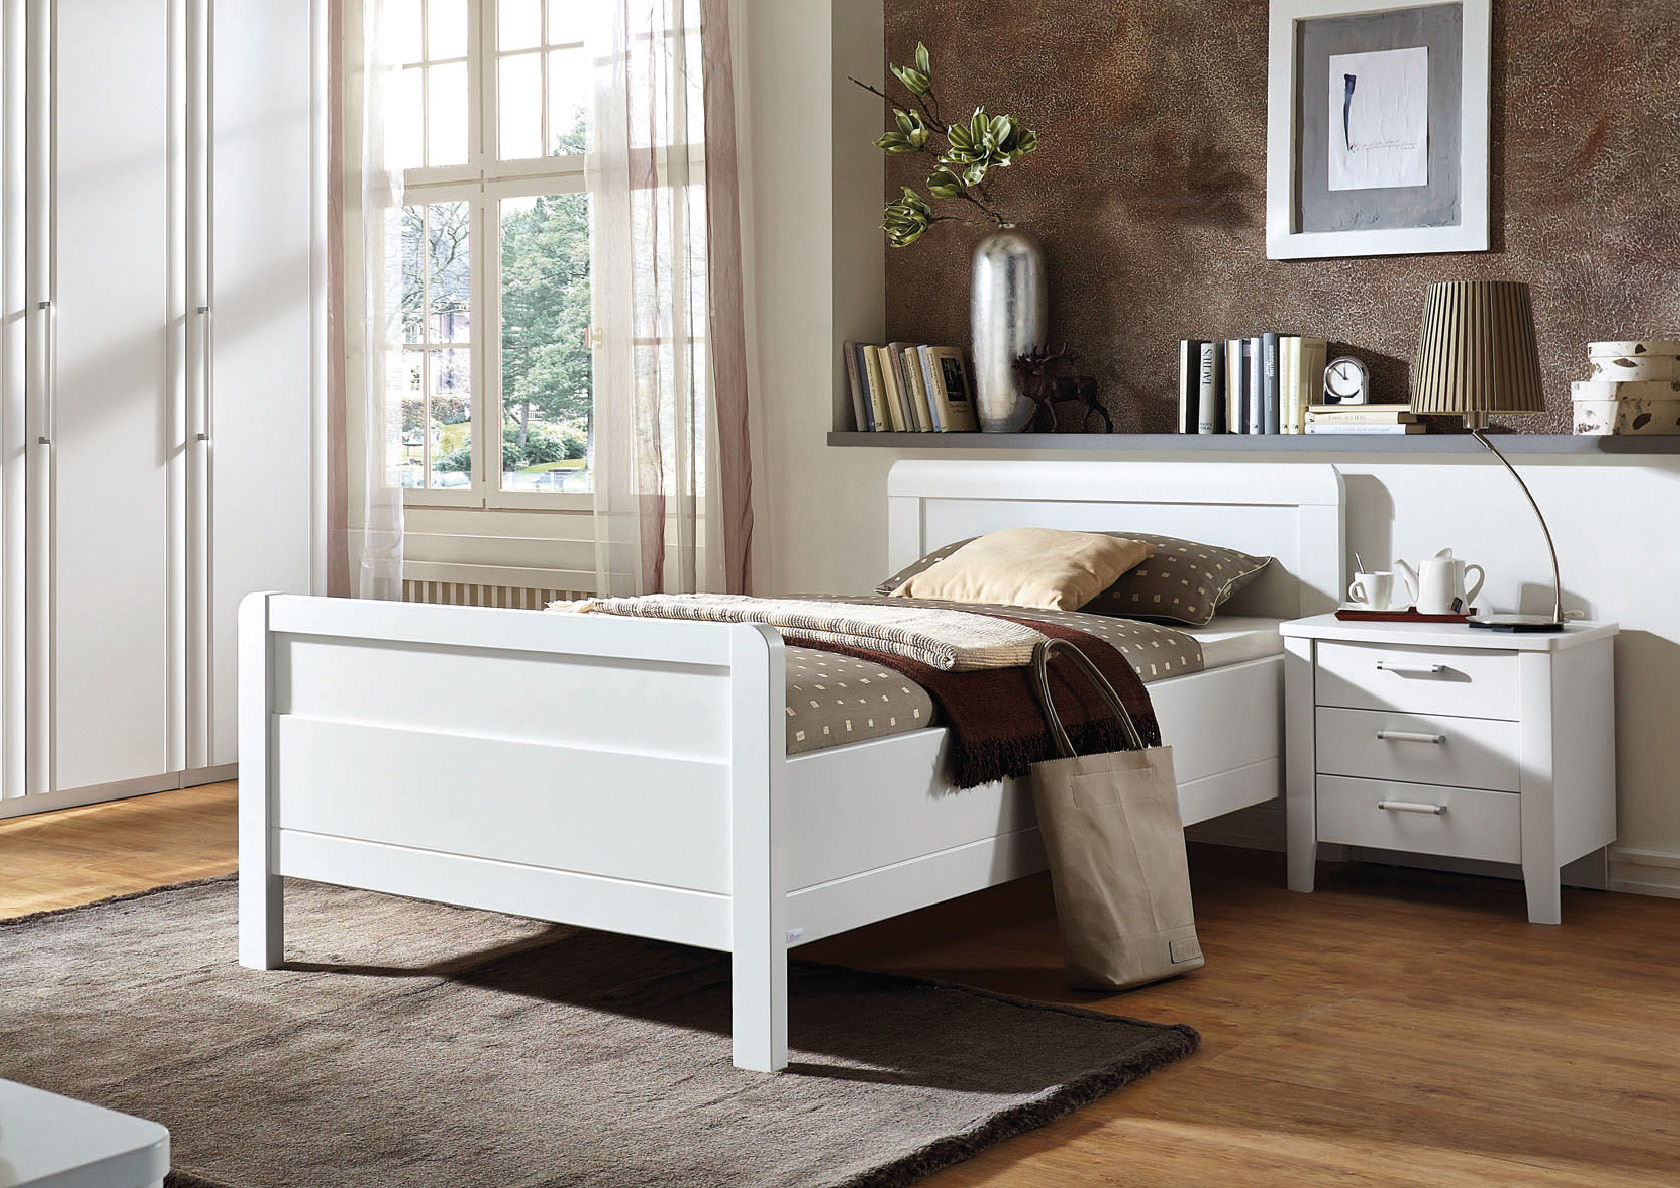 komfort stollenbett peter kling gmbh das bettenhaus m bel kling in pirmasens. Black Bedroom Furniture Sets. Home Design Ideas